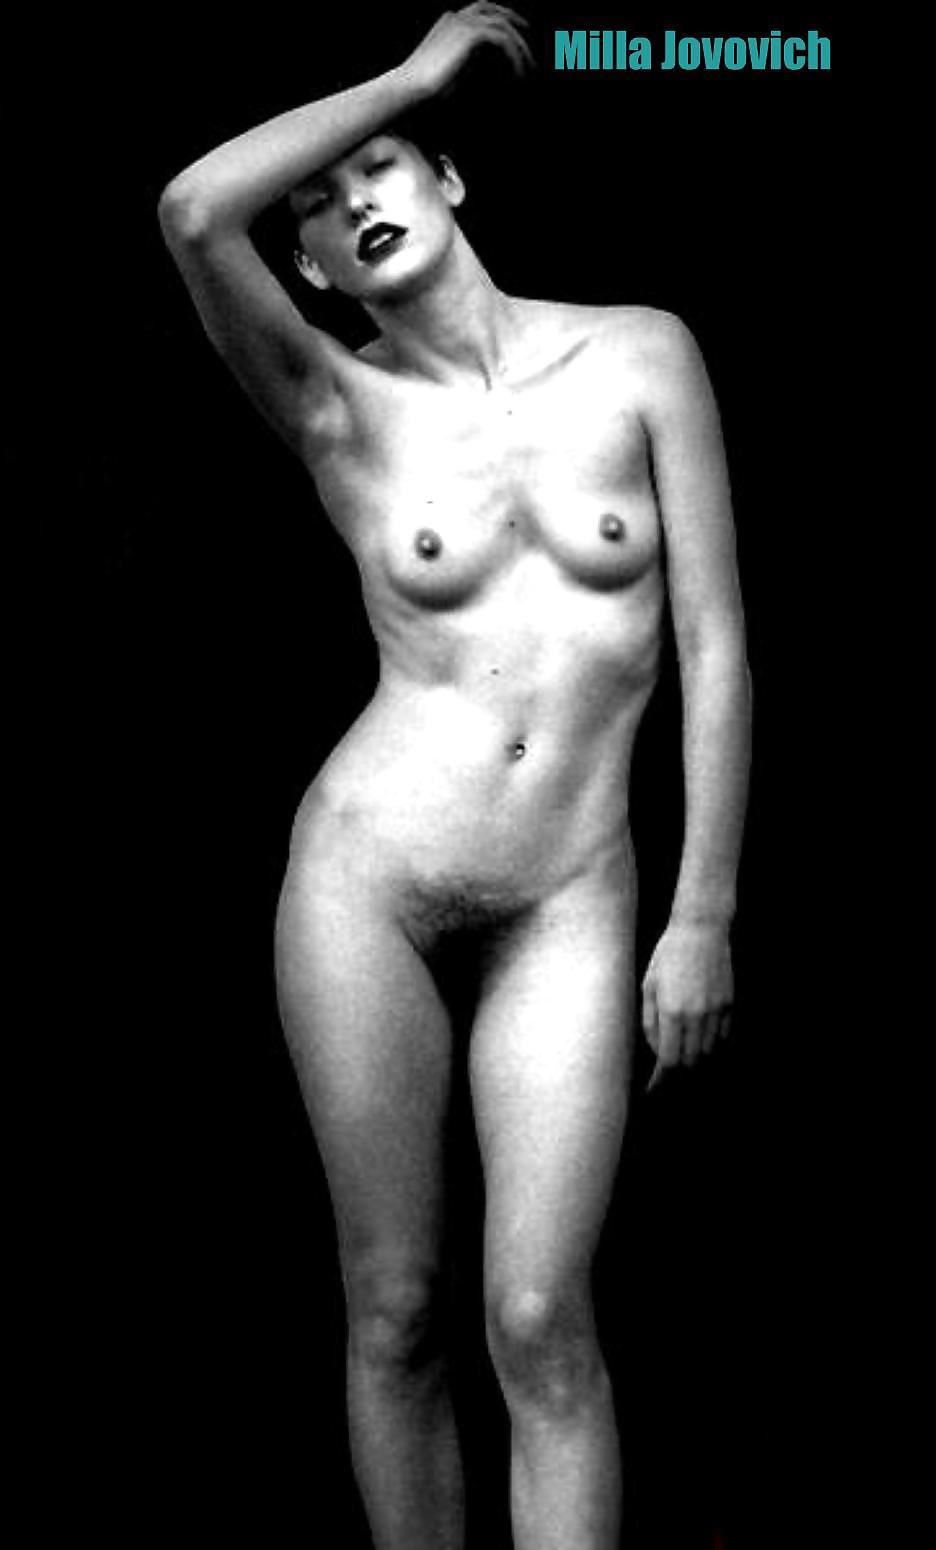 photos Celebrity nude movie or